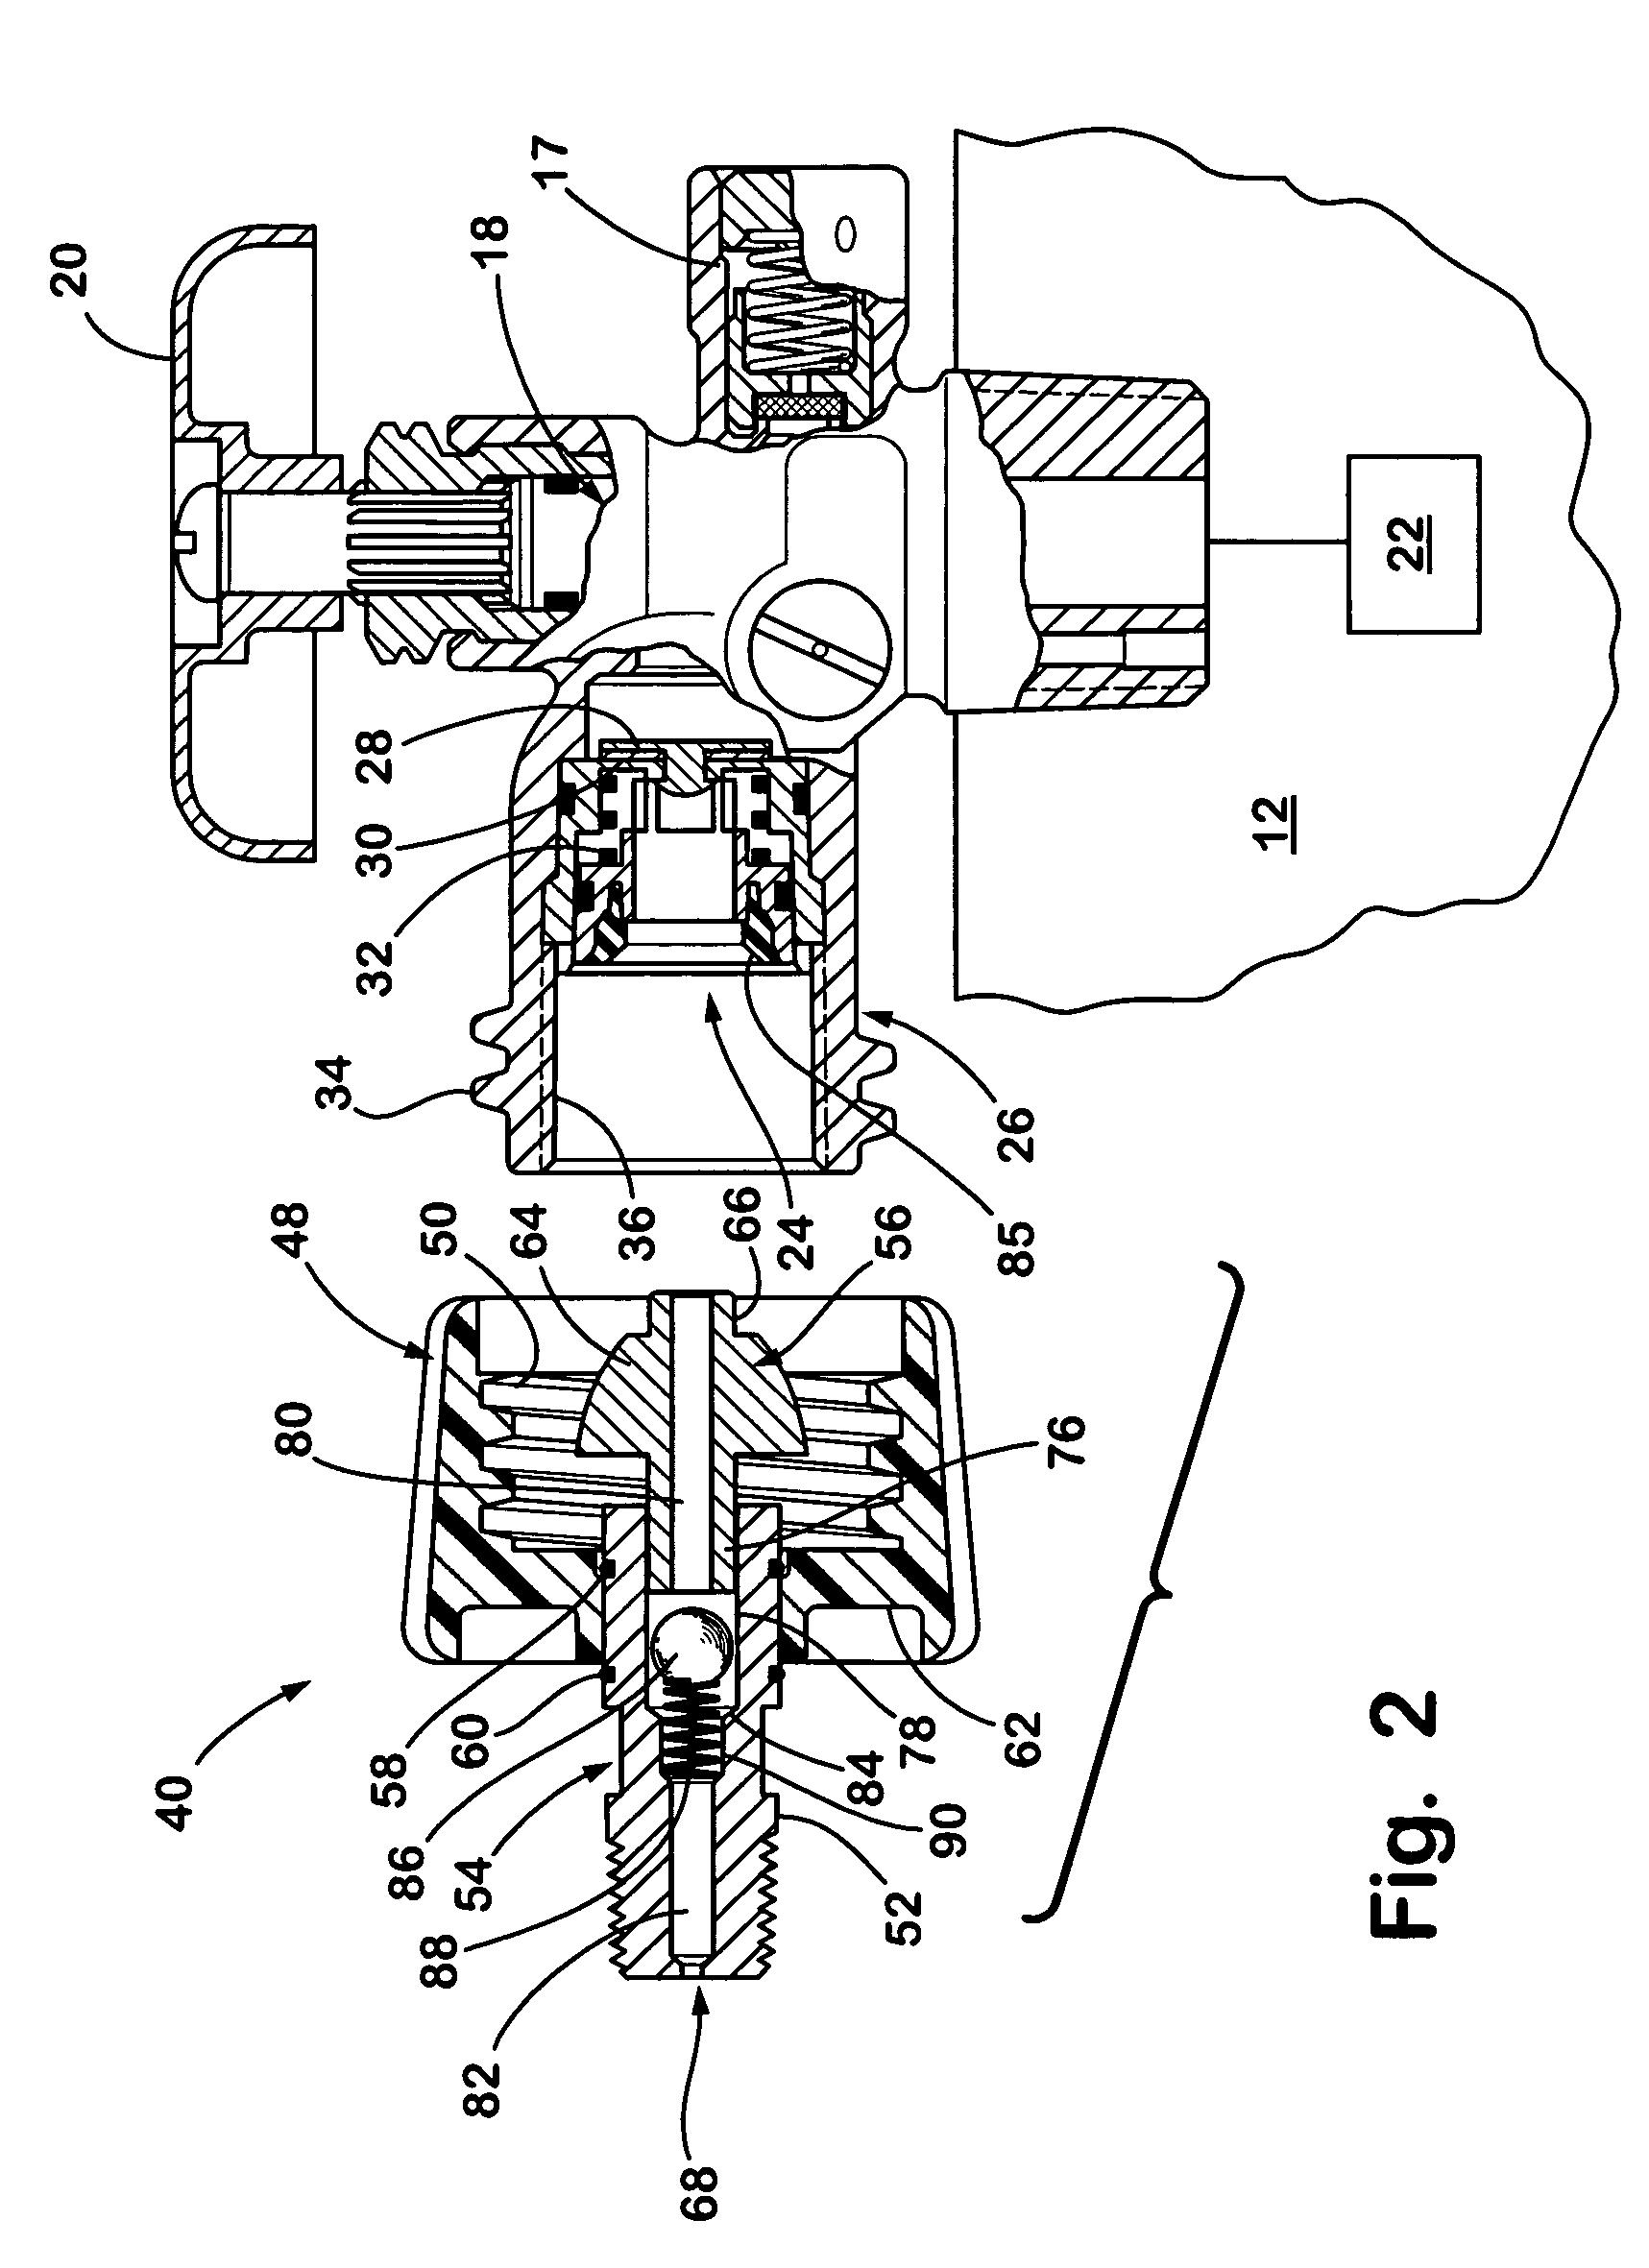 propane tank valve schematic